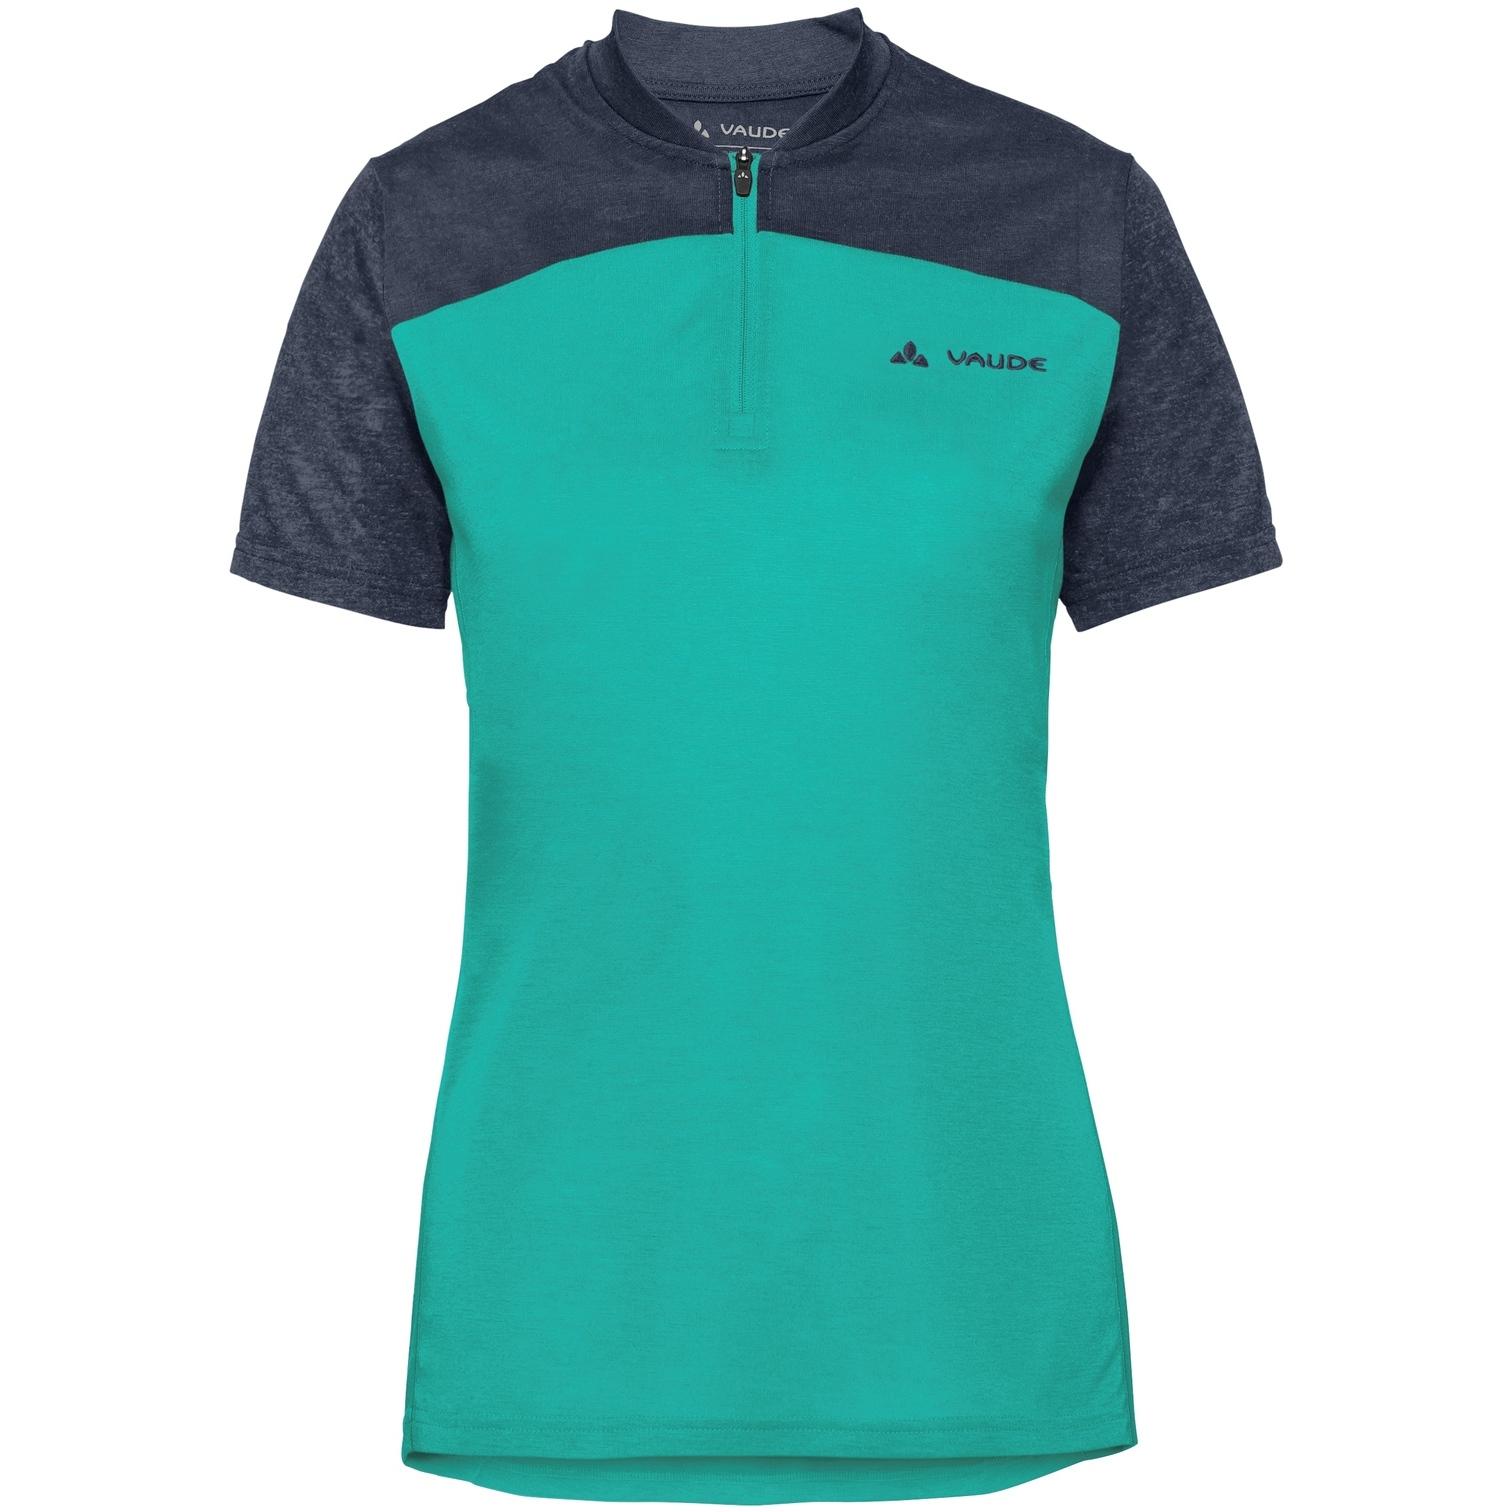 Vaude Tremalzo Damen-Shirt IV - peacock